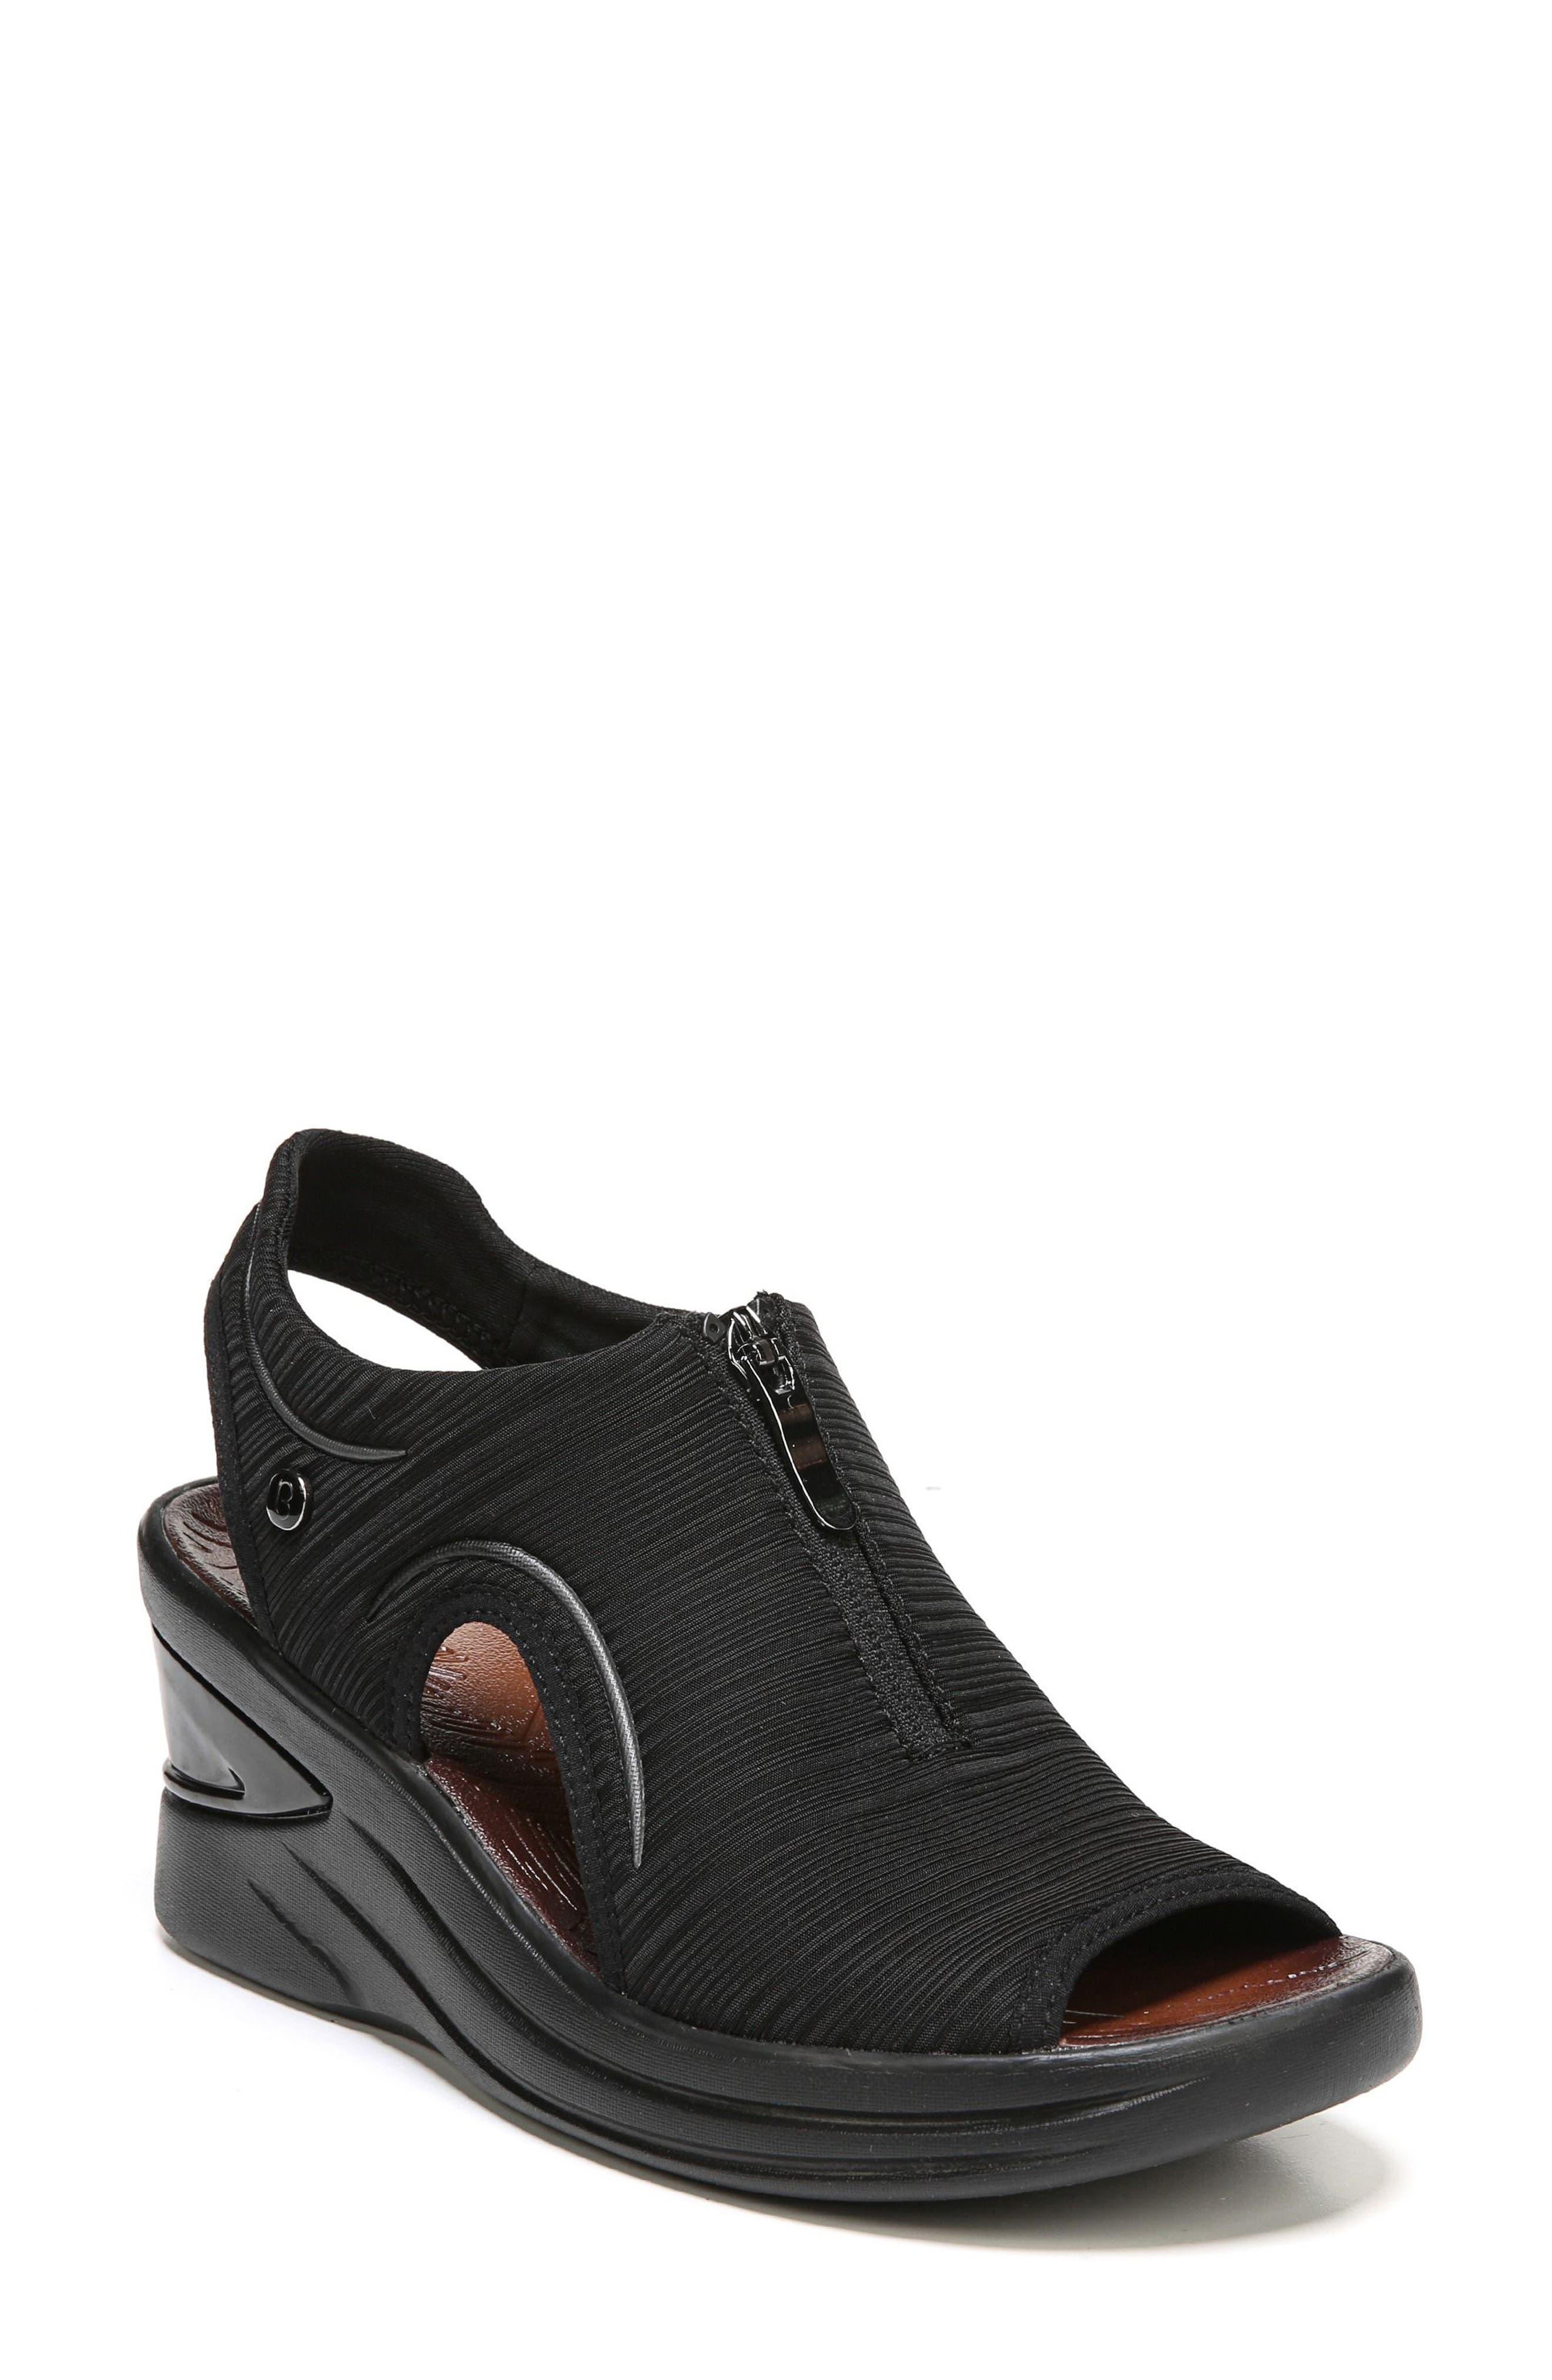 Vinny Wedge Sandal,                         Main,                         color, BLACK FABRIC